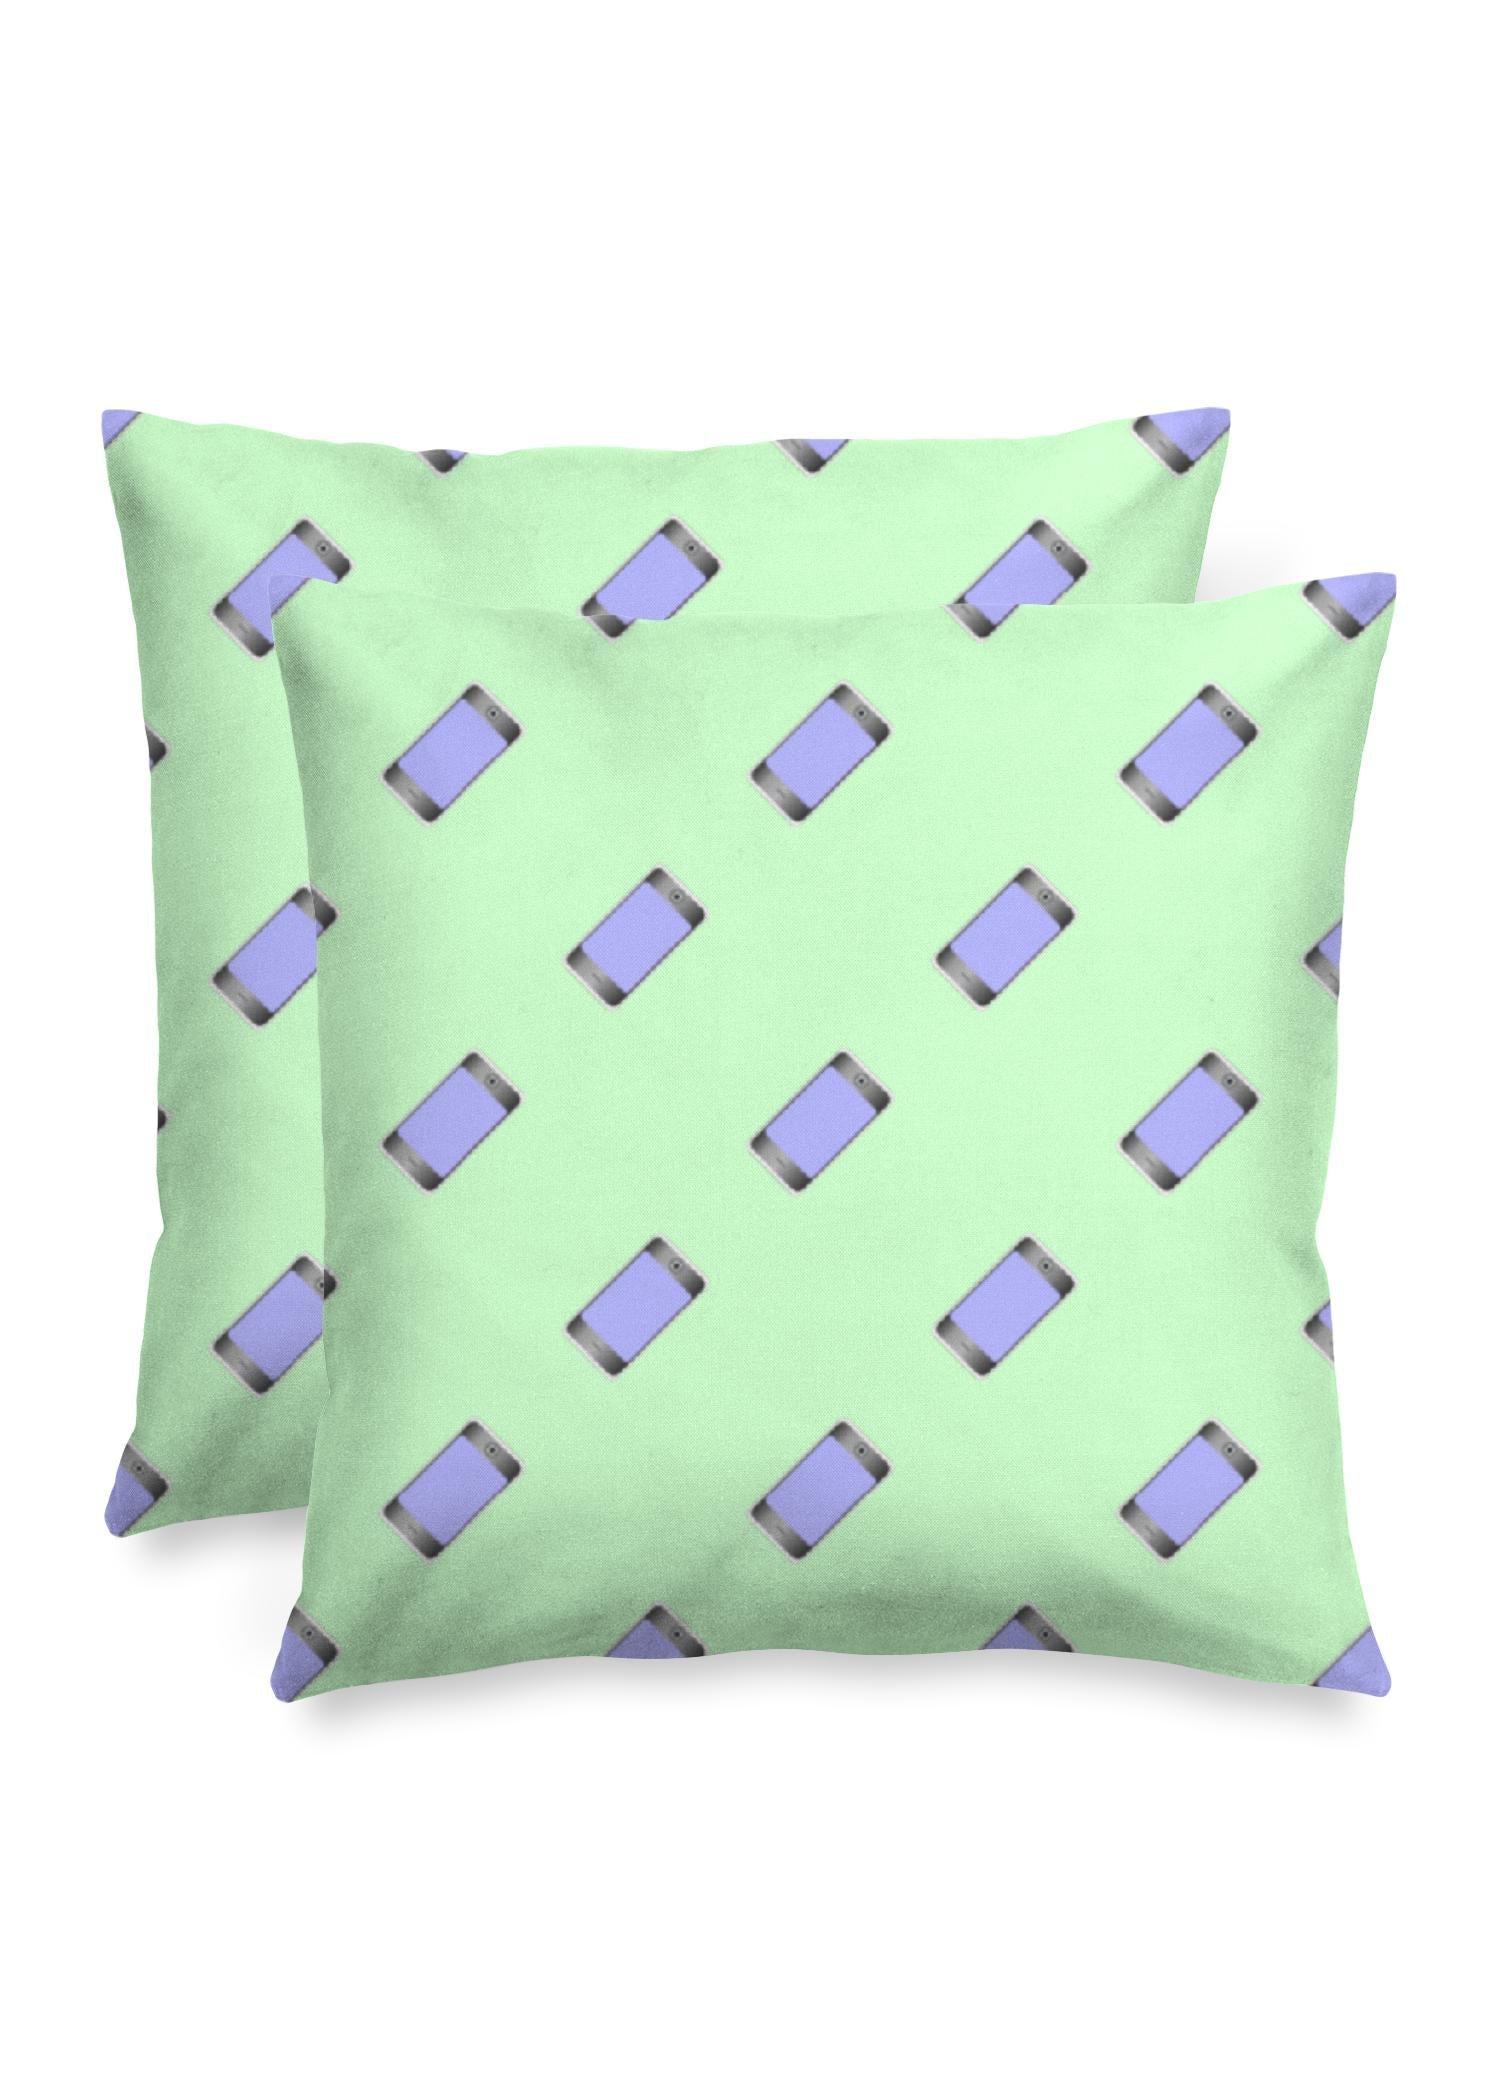 "VIDA Square Pillow - Mobile Phones On Green in Green by VIDA Original Artist  - Size: Matte / 16"" / Set"